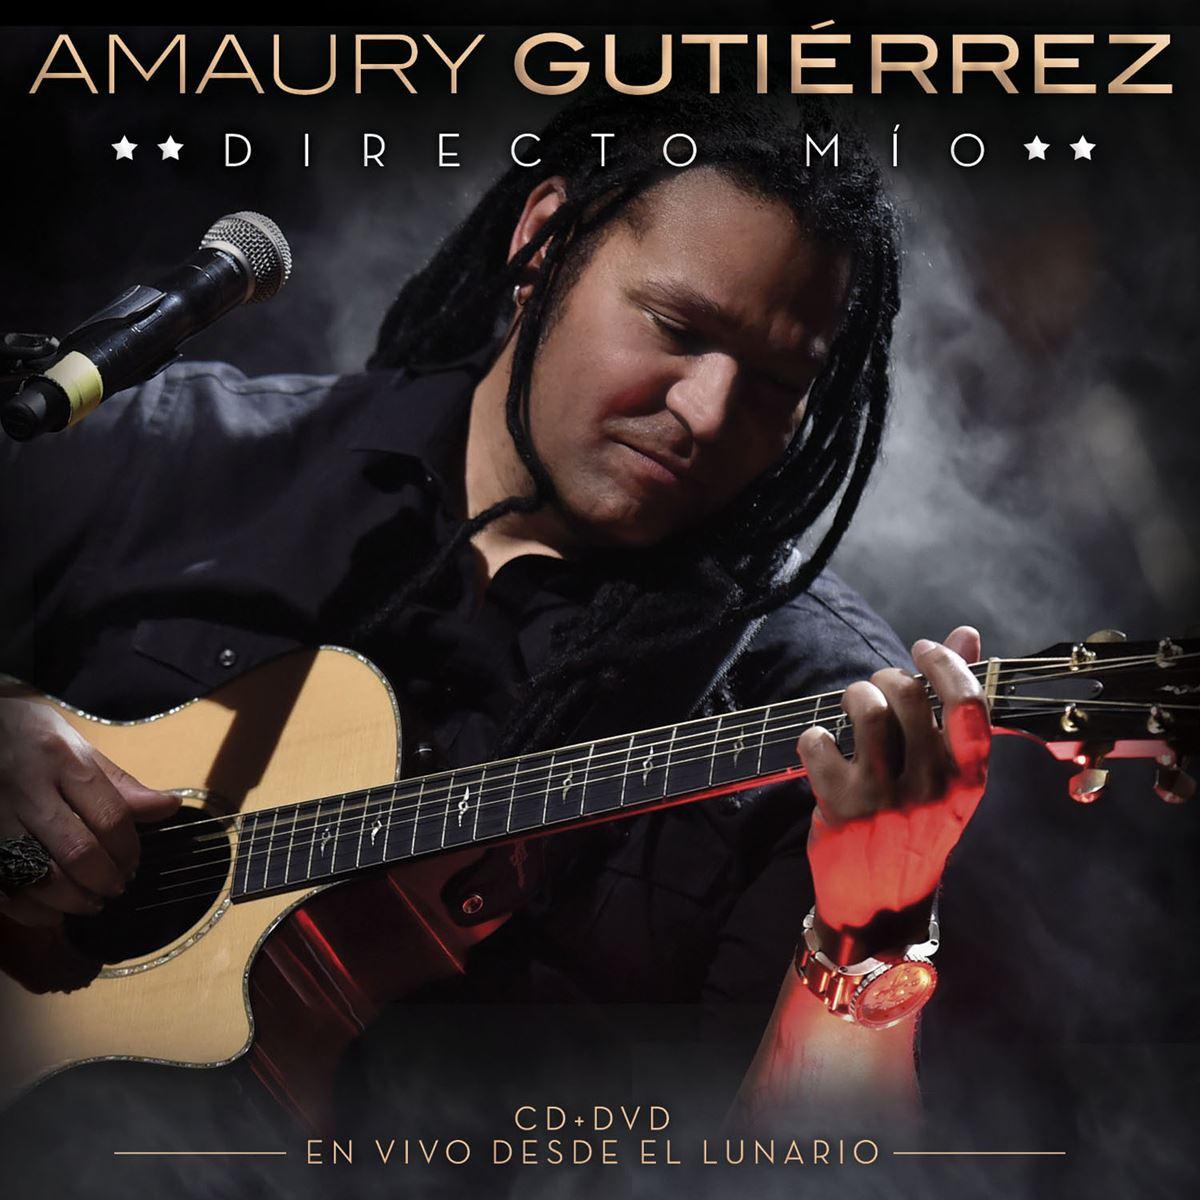 CD/ DVD Amaury Gutiérrez- Directo Mío